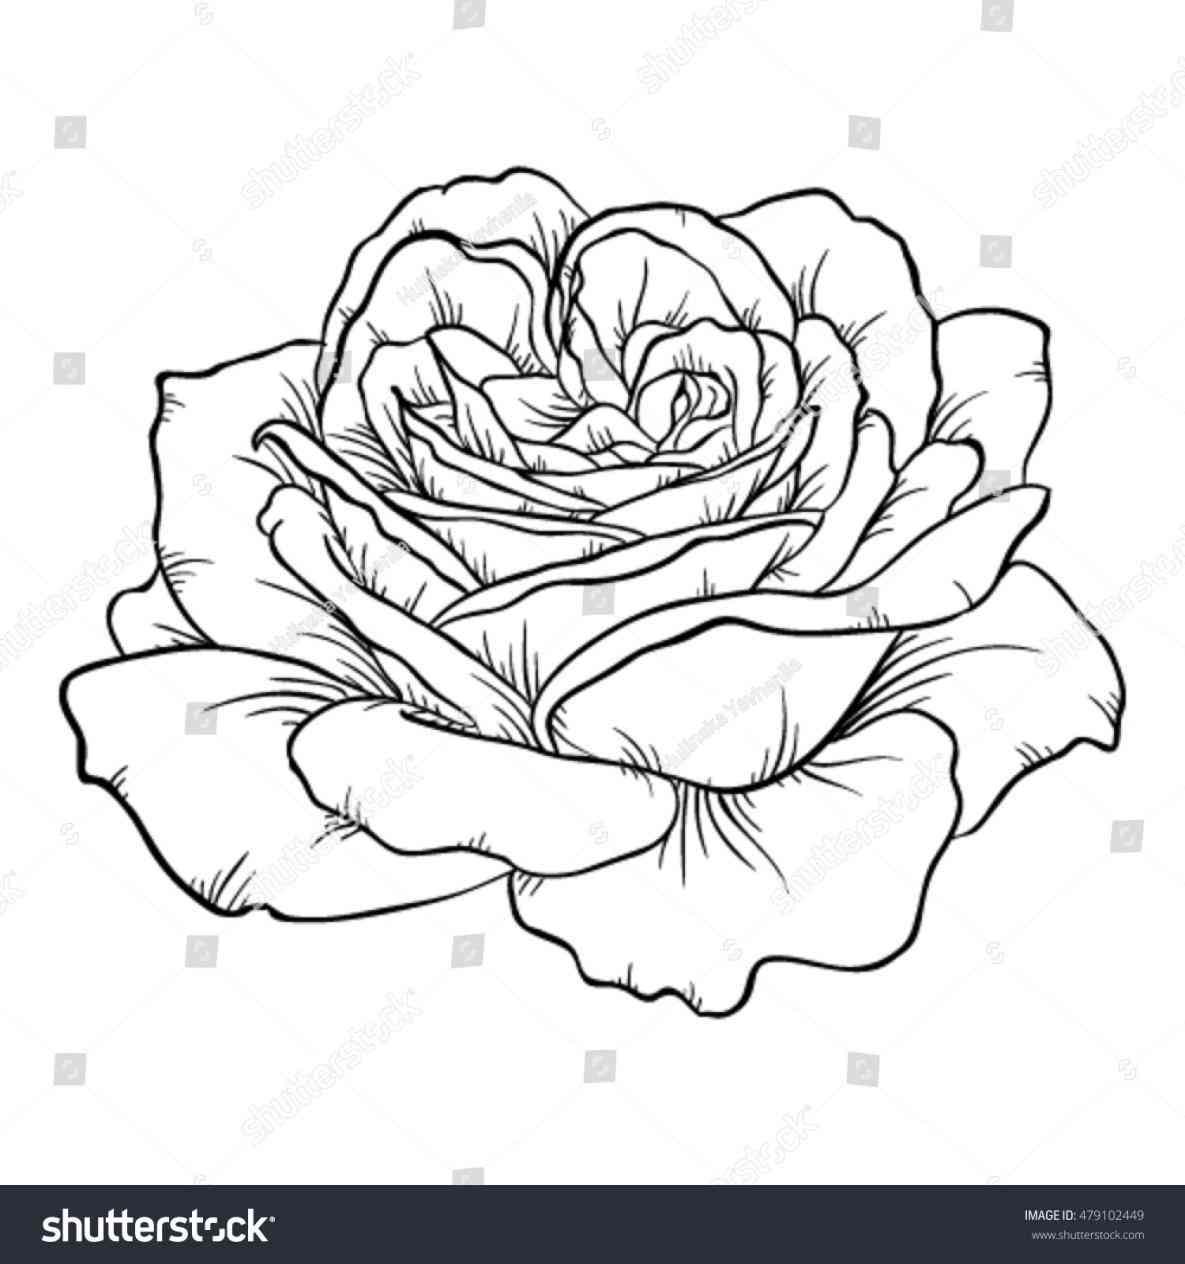 1185x1264 White Rose Black Background Drawing Freespywarefixescom